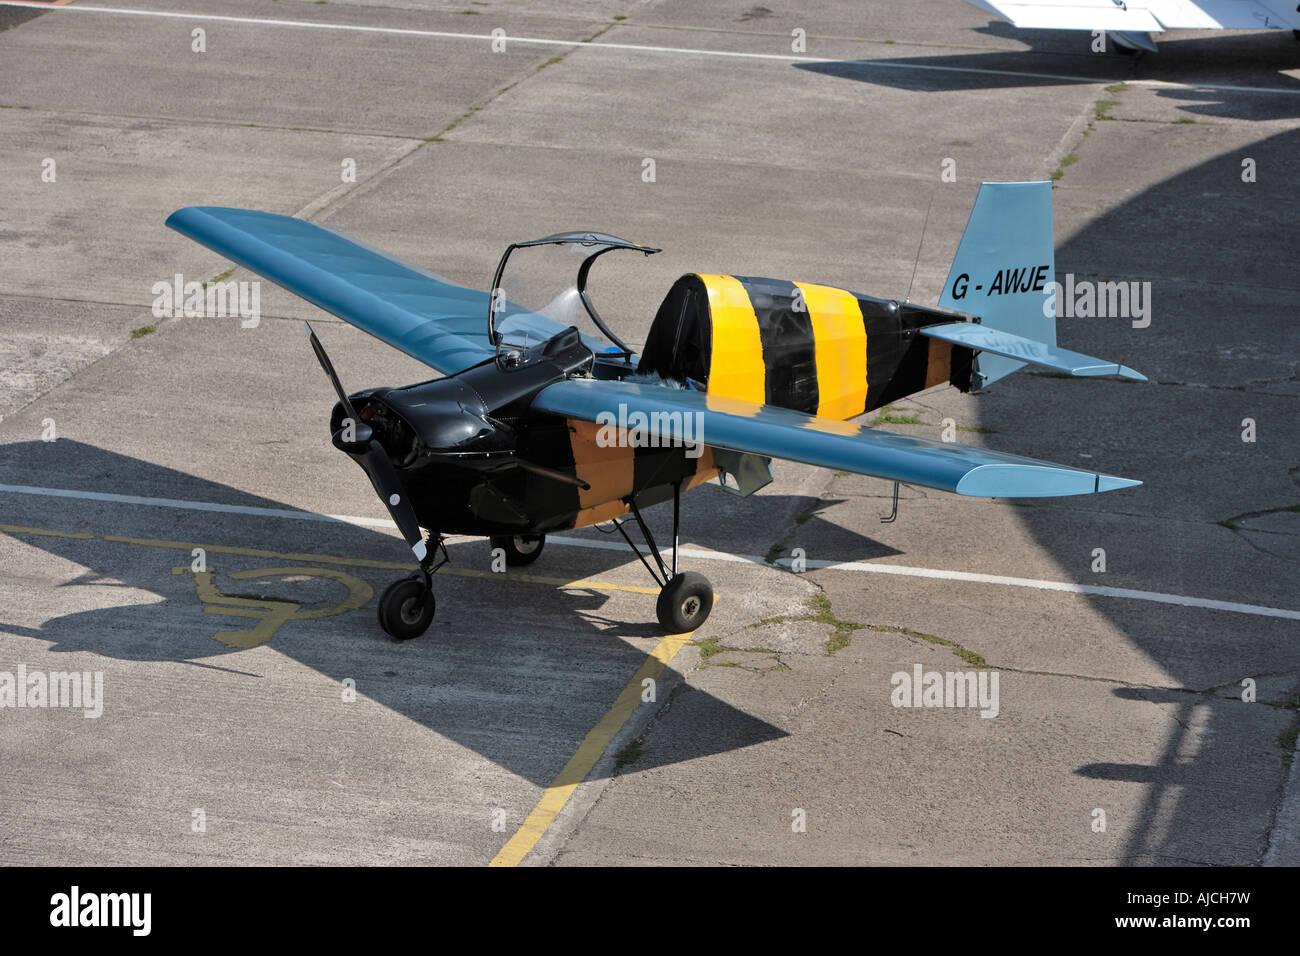 Tipsy T66 Nipper Barton Aerodrome Manchester - Stock Image